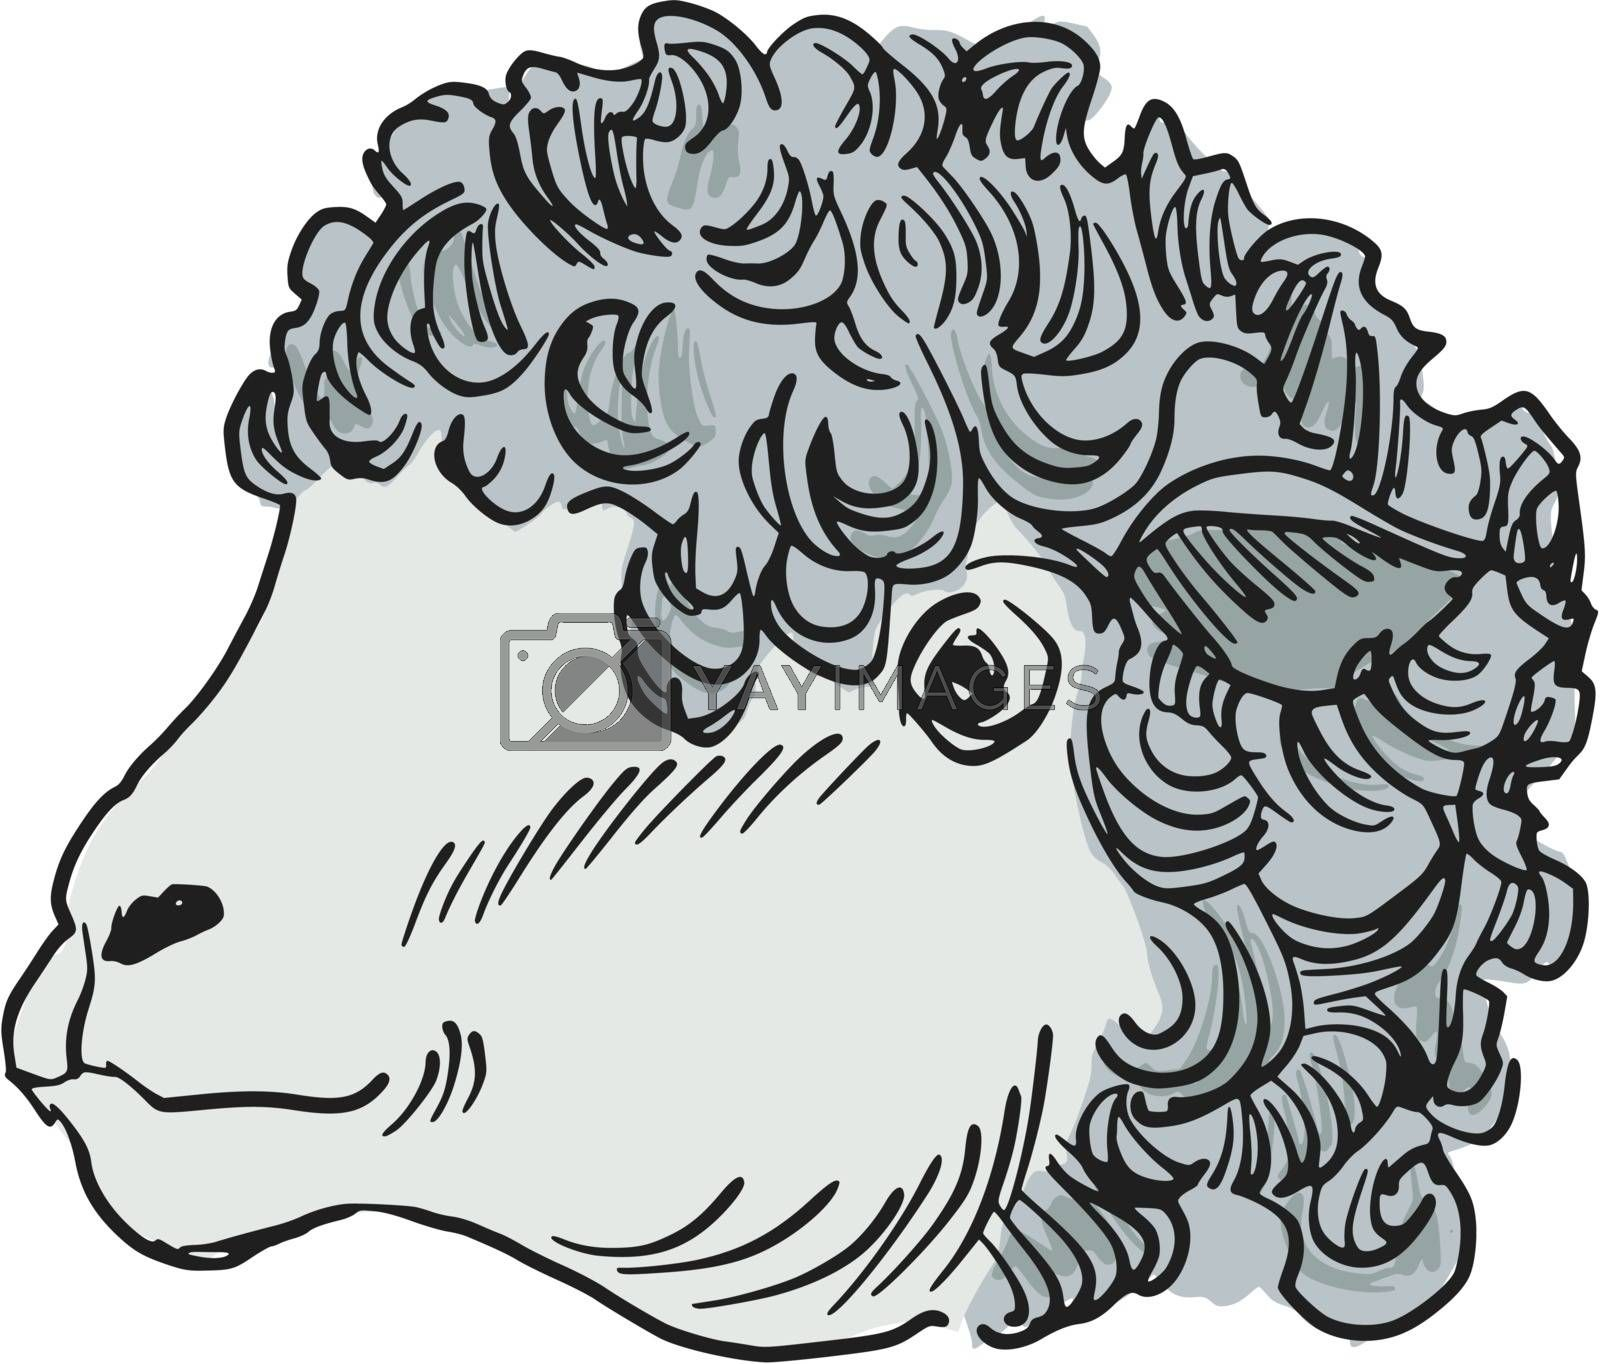 hand drawn, sketch, cartoon illustration of sheep